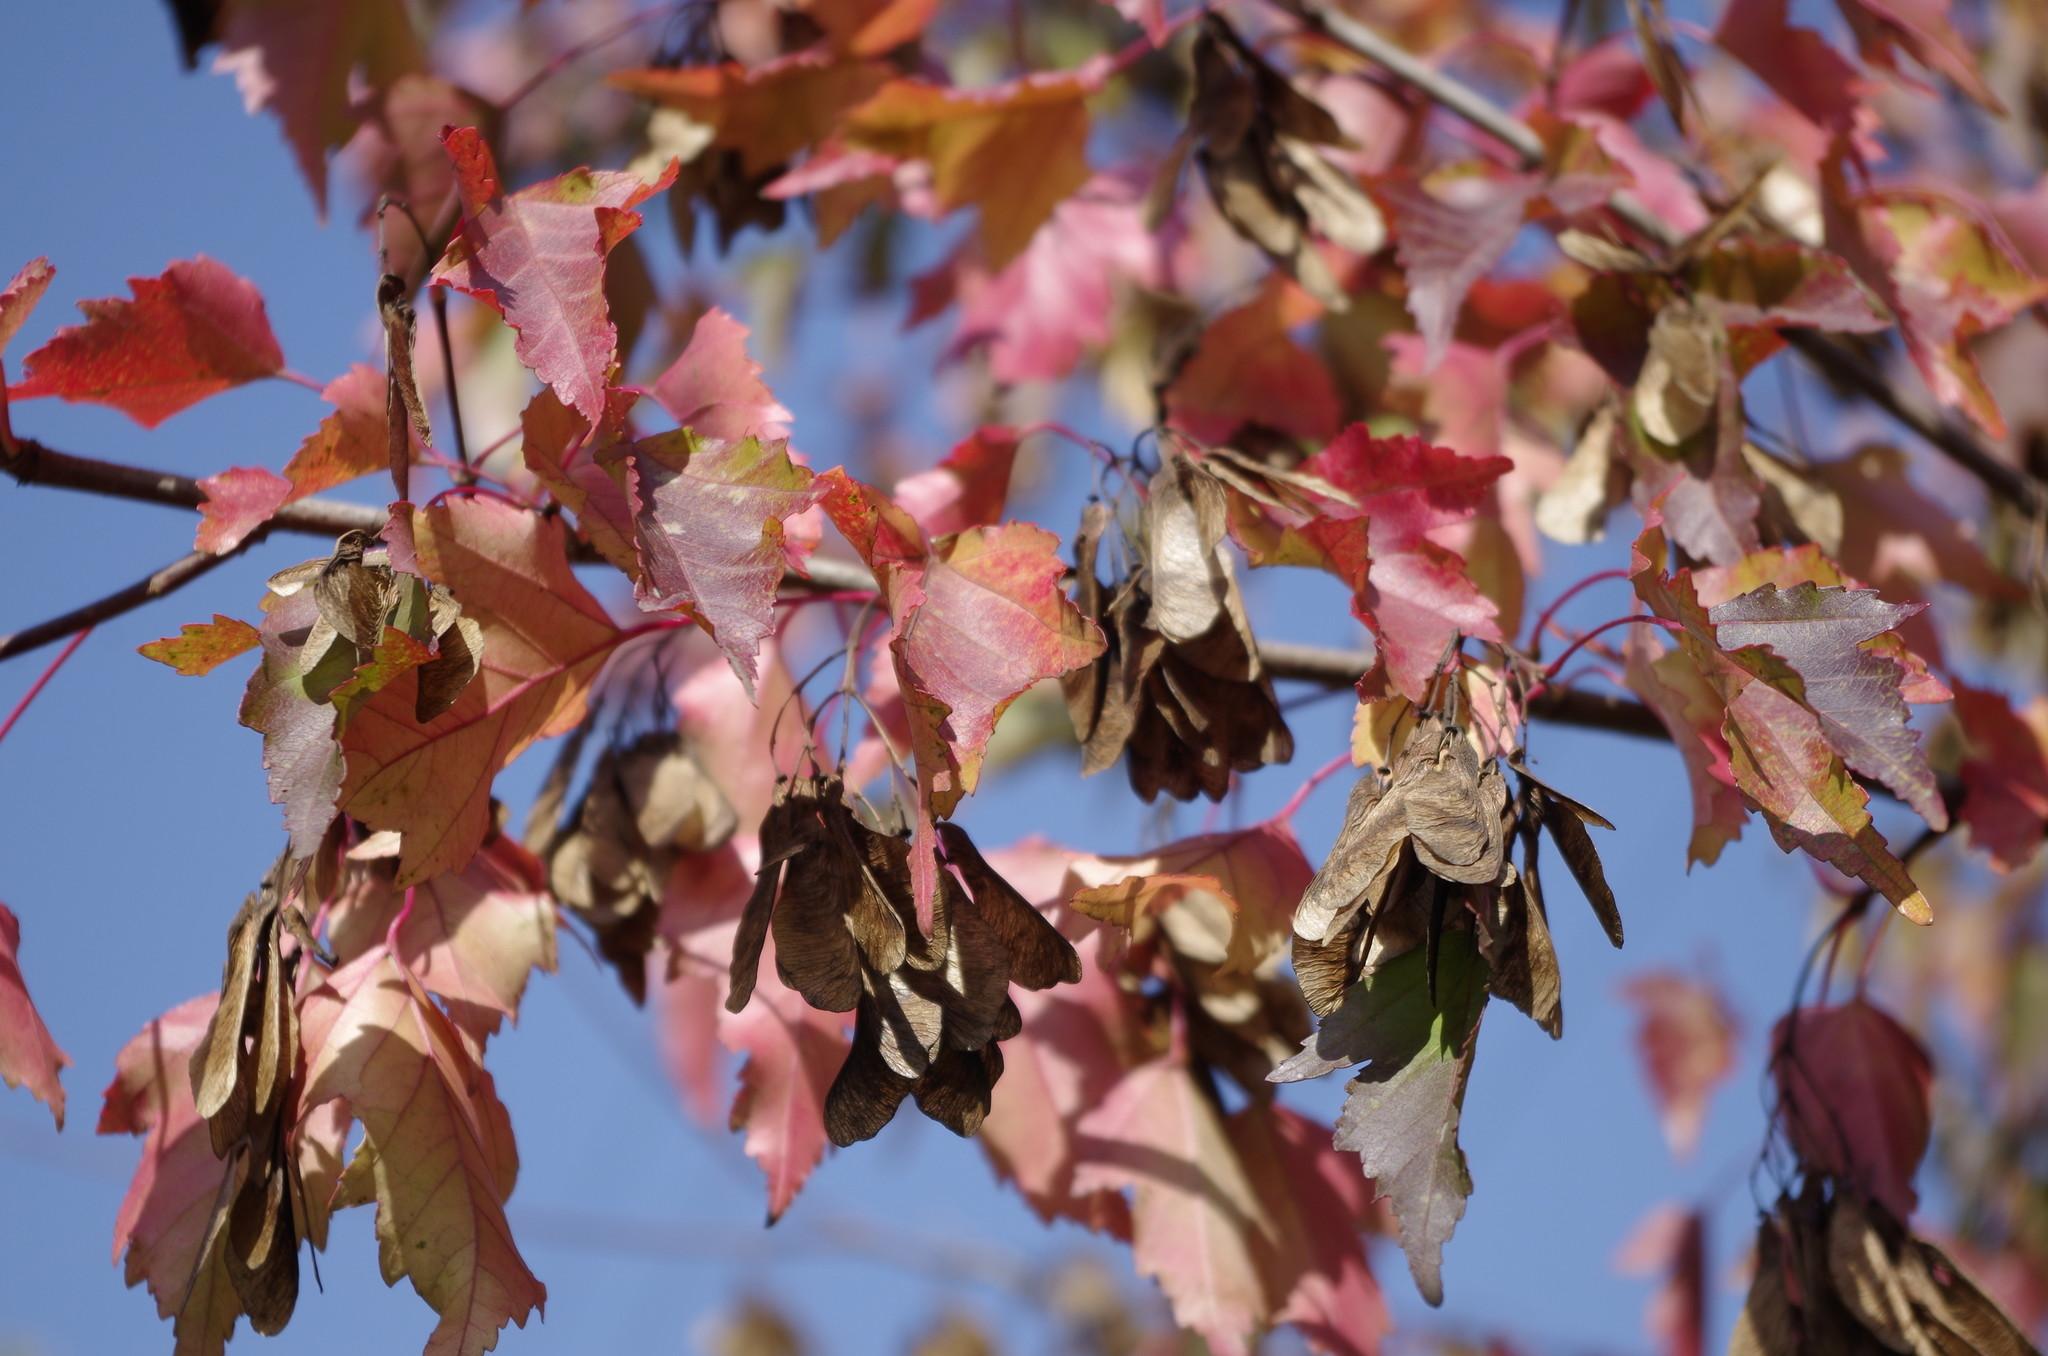 Клён (лат. Acer) осенью